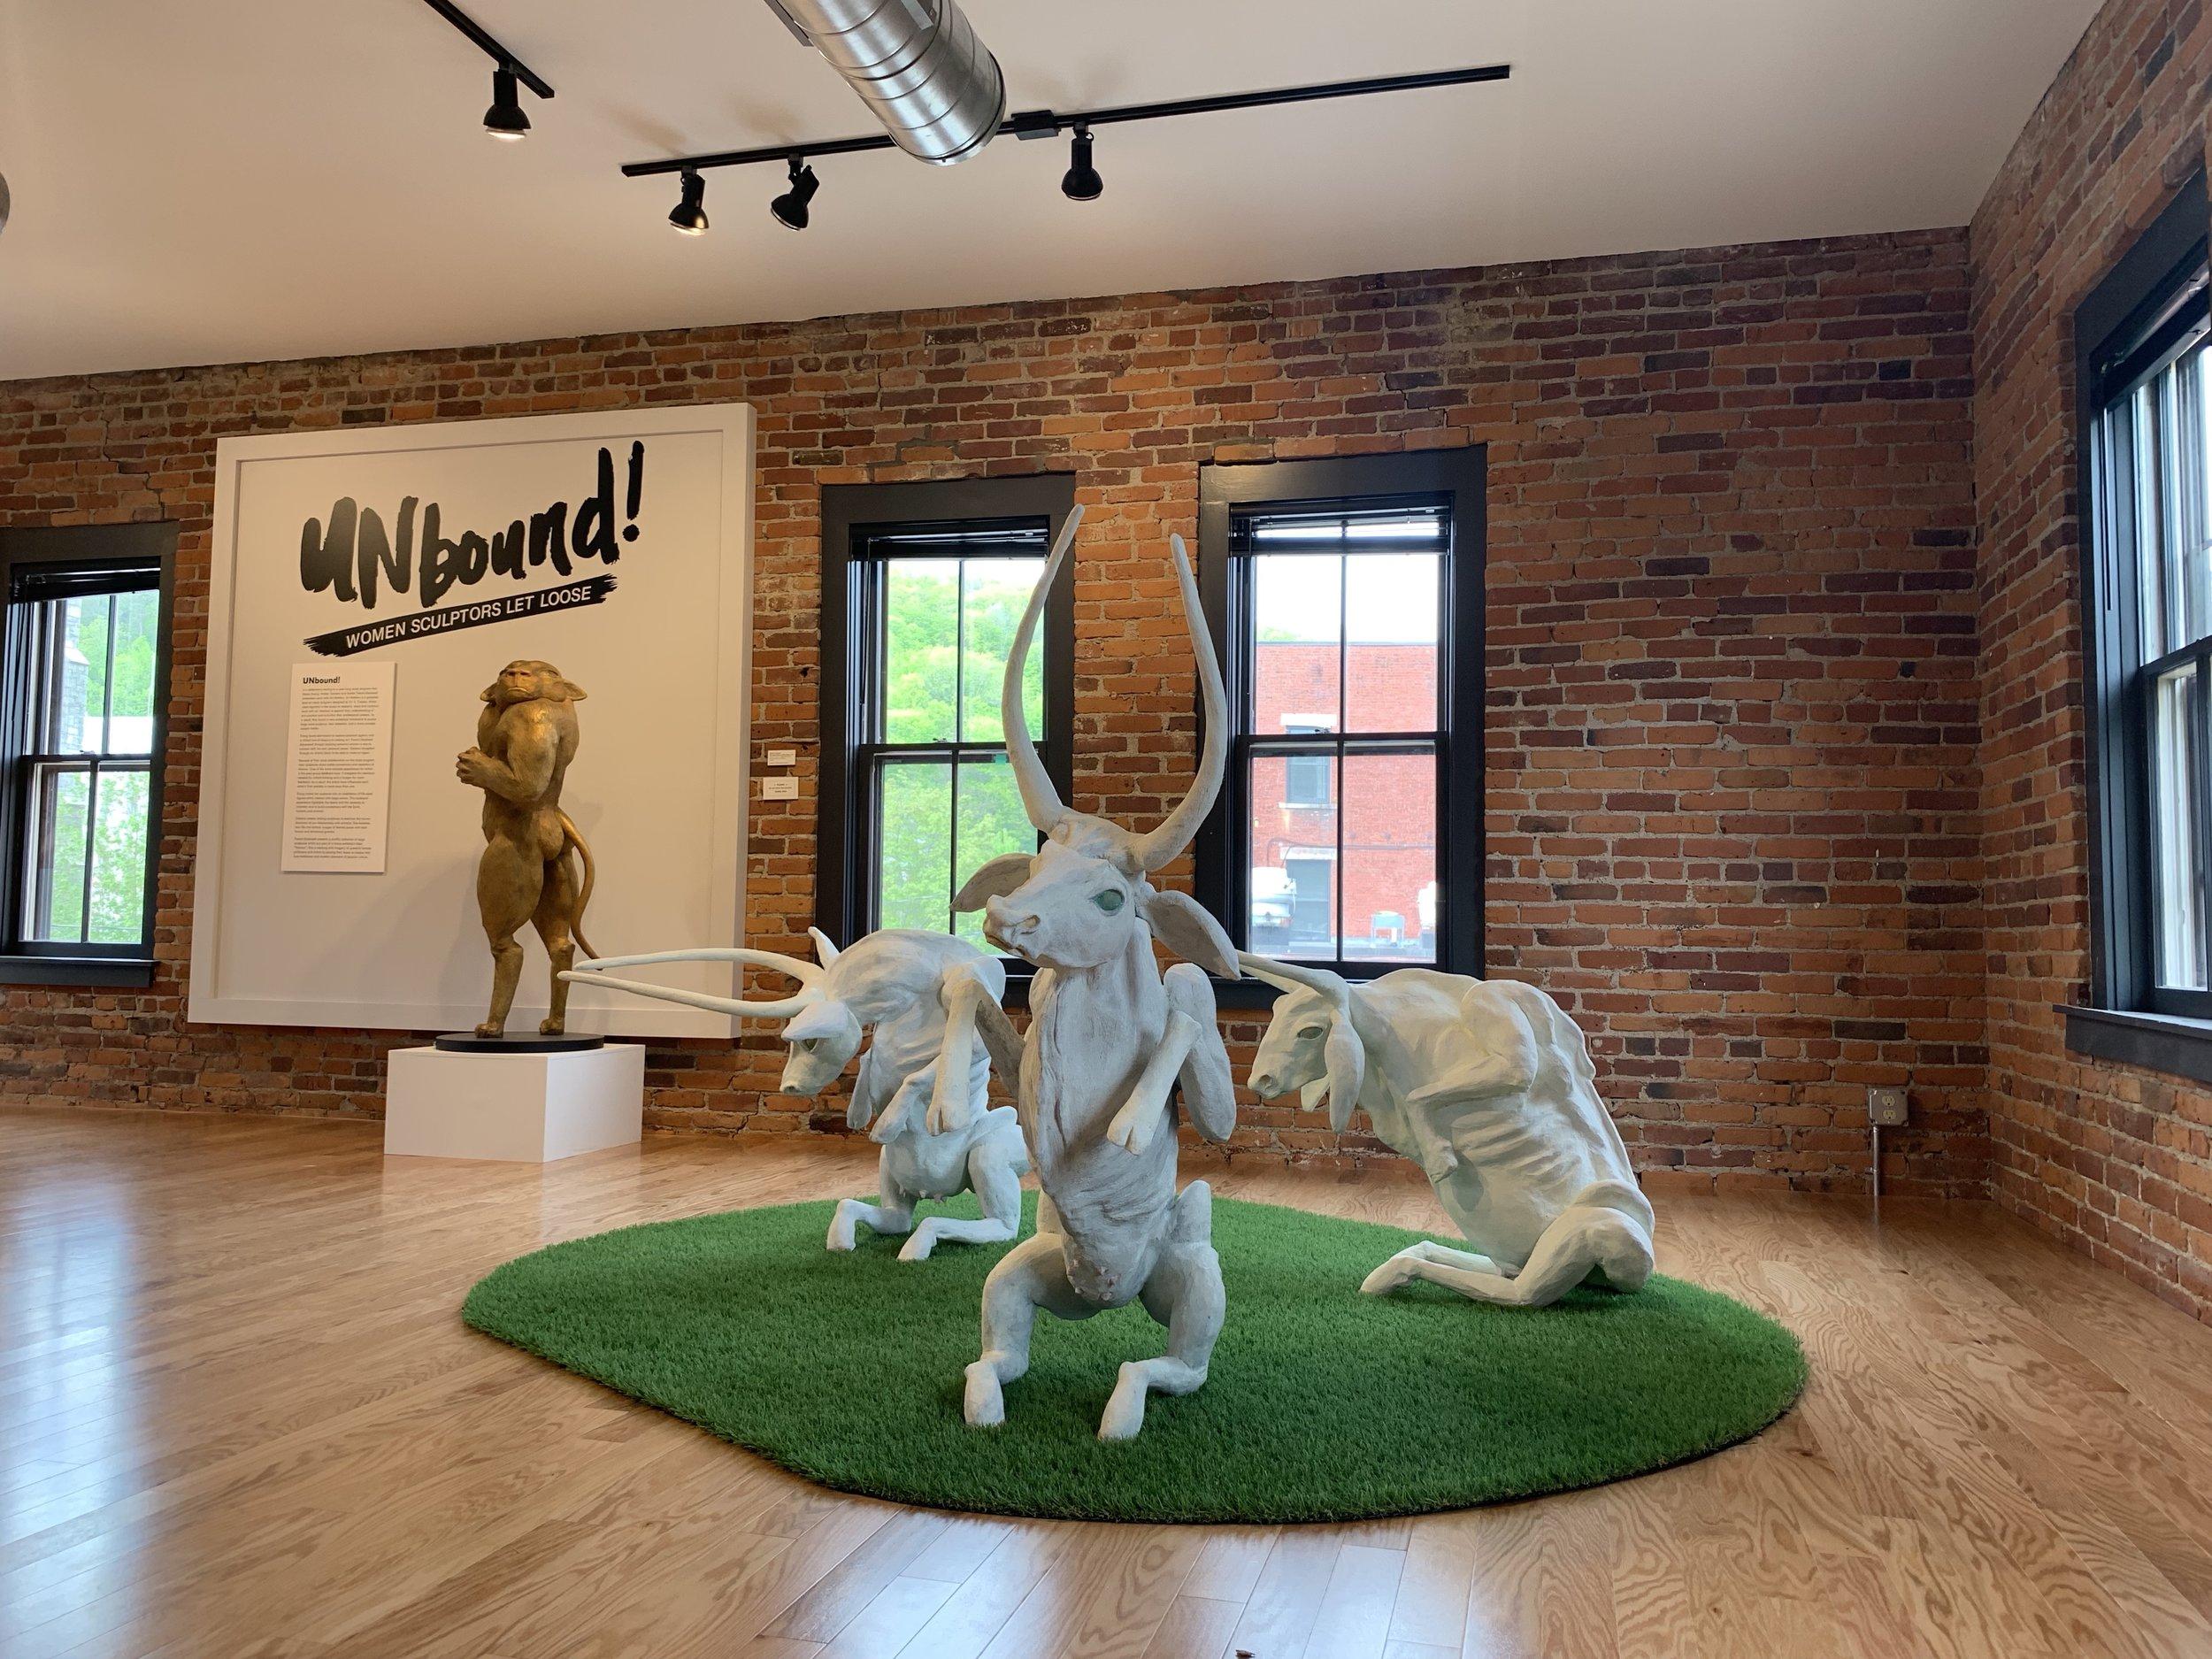 Installation at the Garage Cultural Center, Montpelier, VT, 05/2019